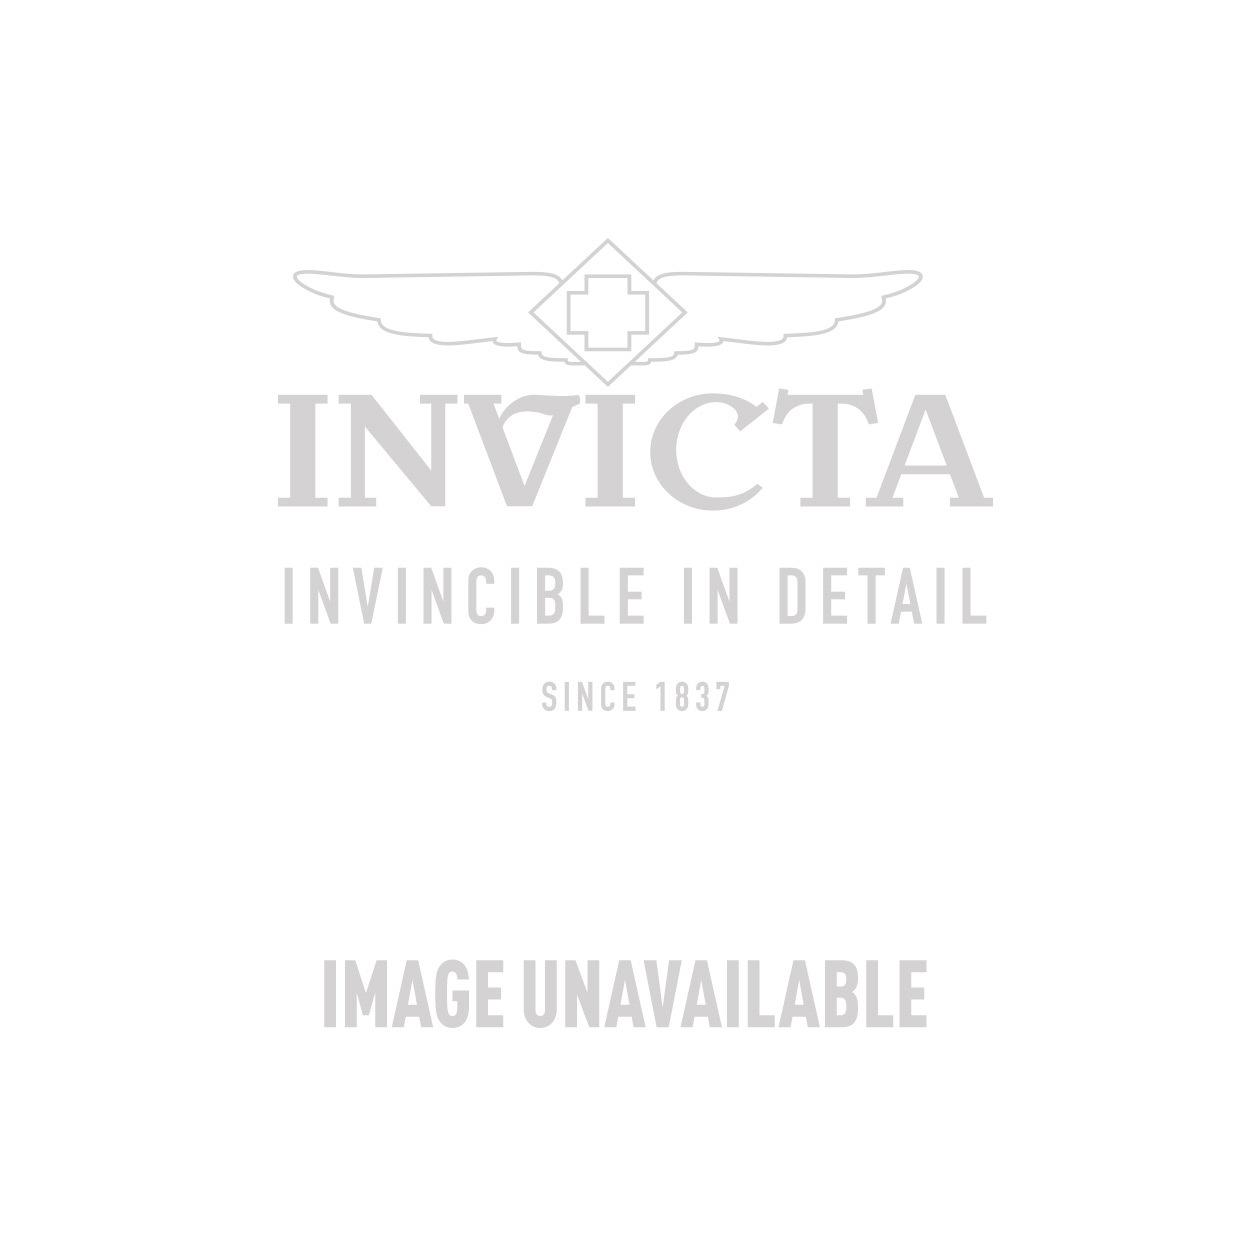 Invicta Bolt Quartz Watch - Gold case with Blue tone Polyurethane band - Model 90269